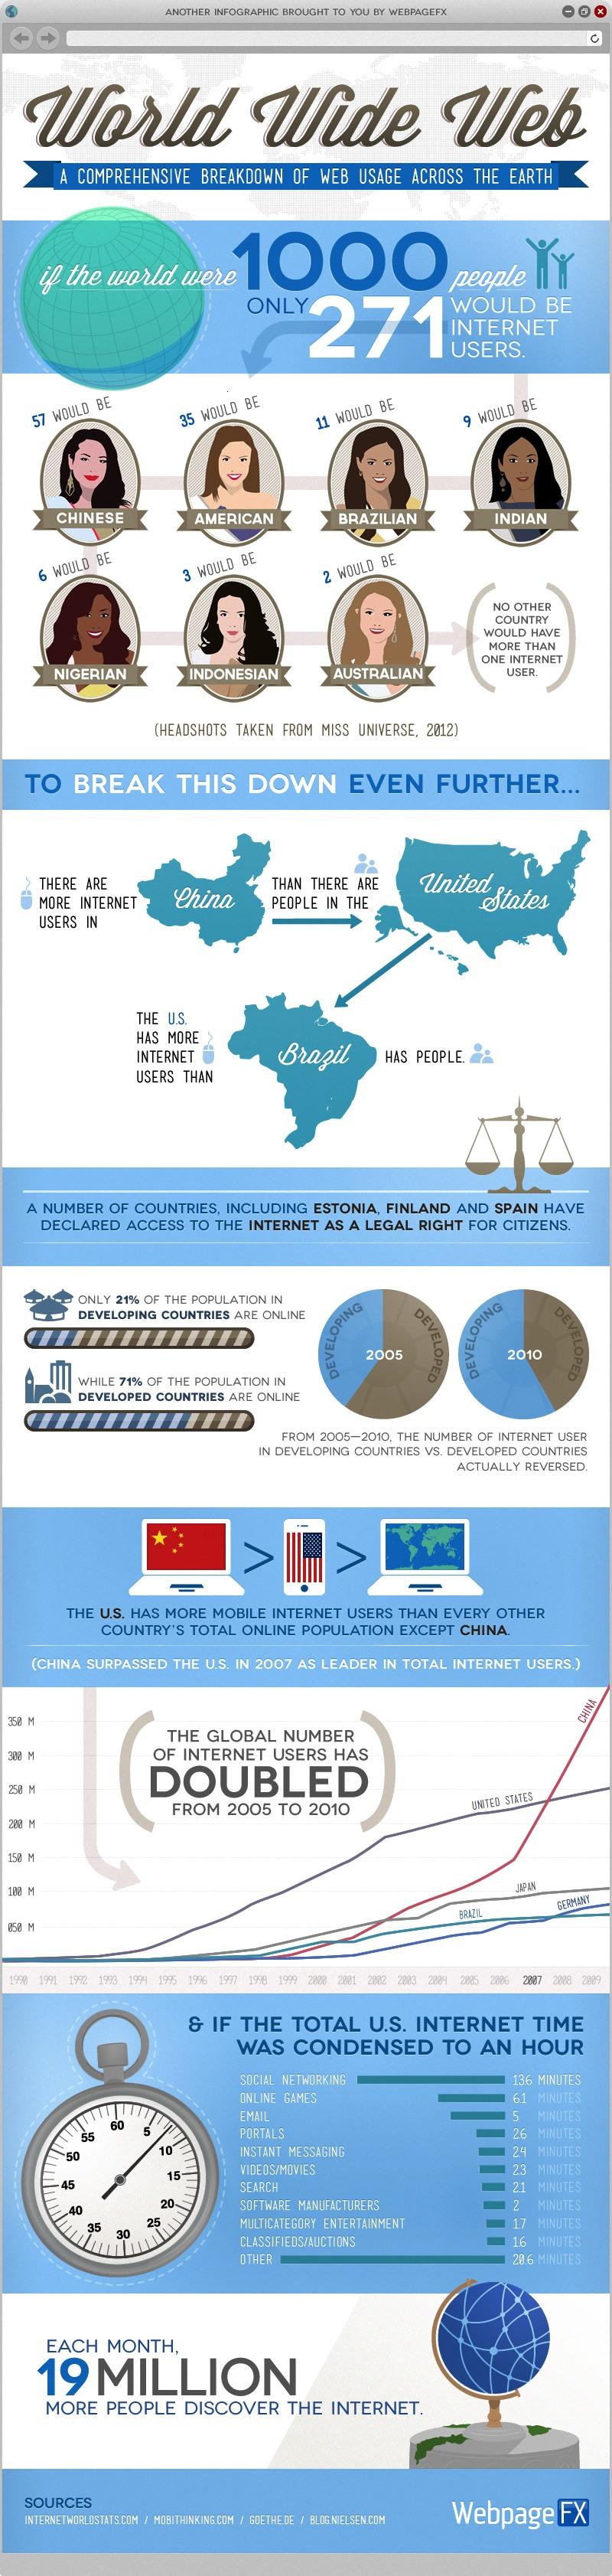 Internet Usage Worldwide Infographic